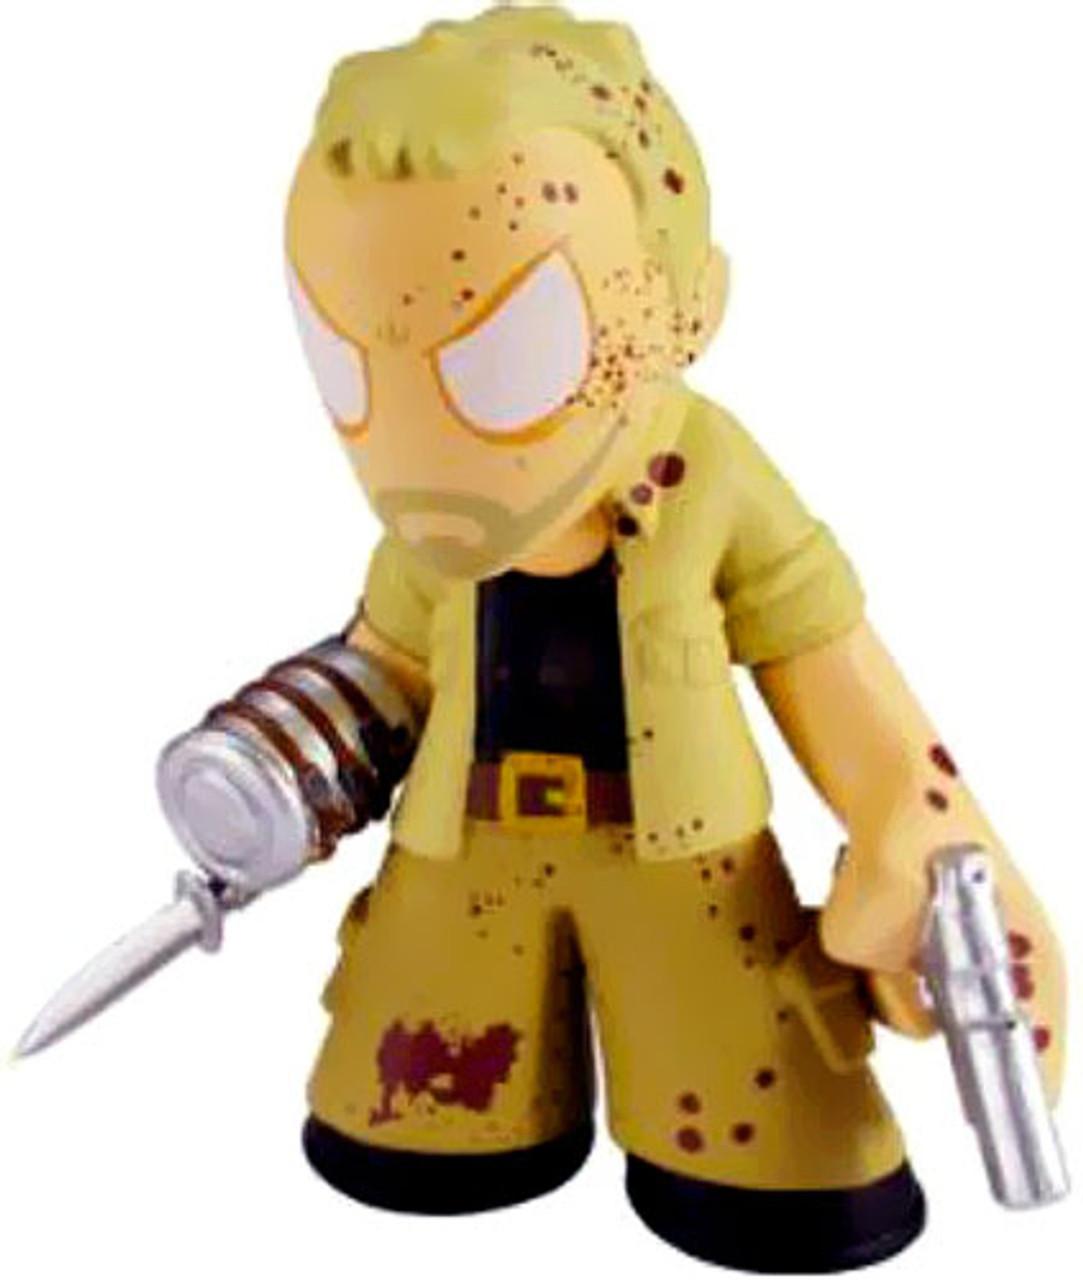 Funko Walking Dead Mystery Minis Series 1 Bloody Merle Dixon Mystery Minifigure [Blood Splattered Loose]